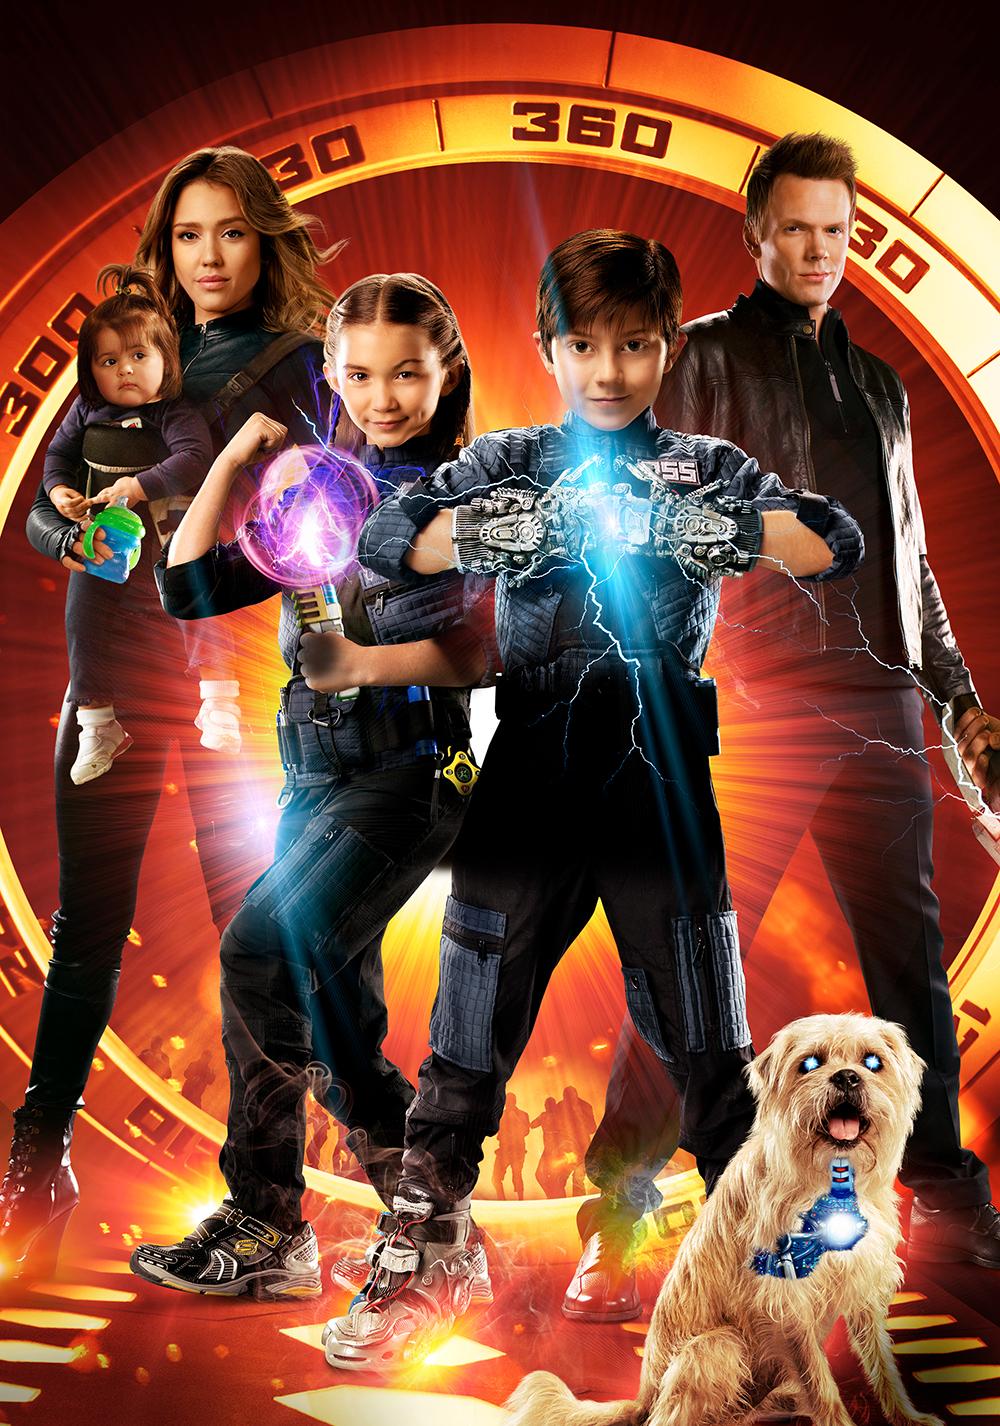 Spy Kids: All the Time in the World | Movie fanart | fanart.tv